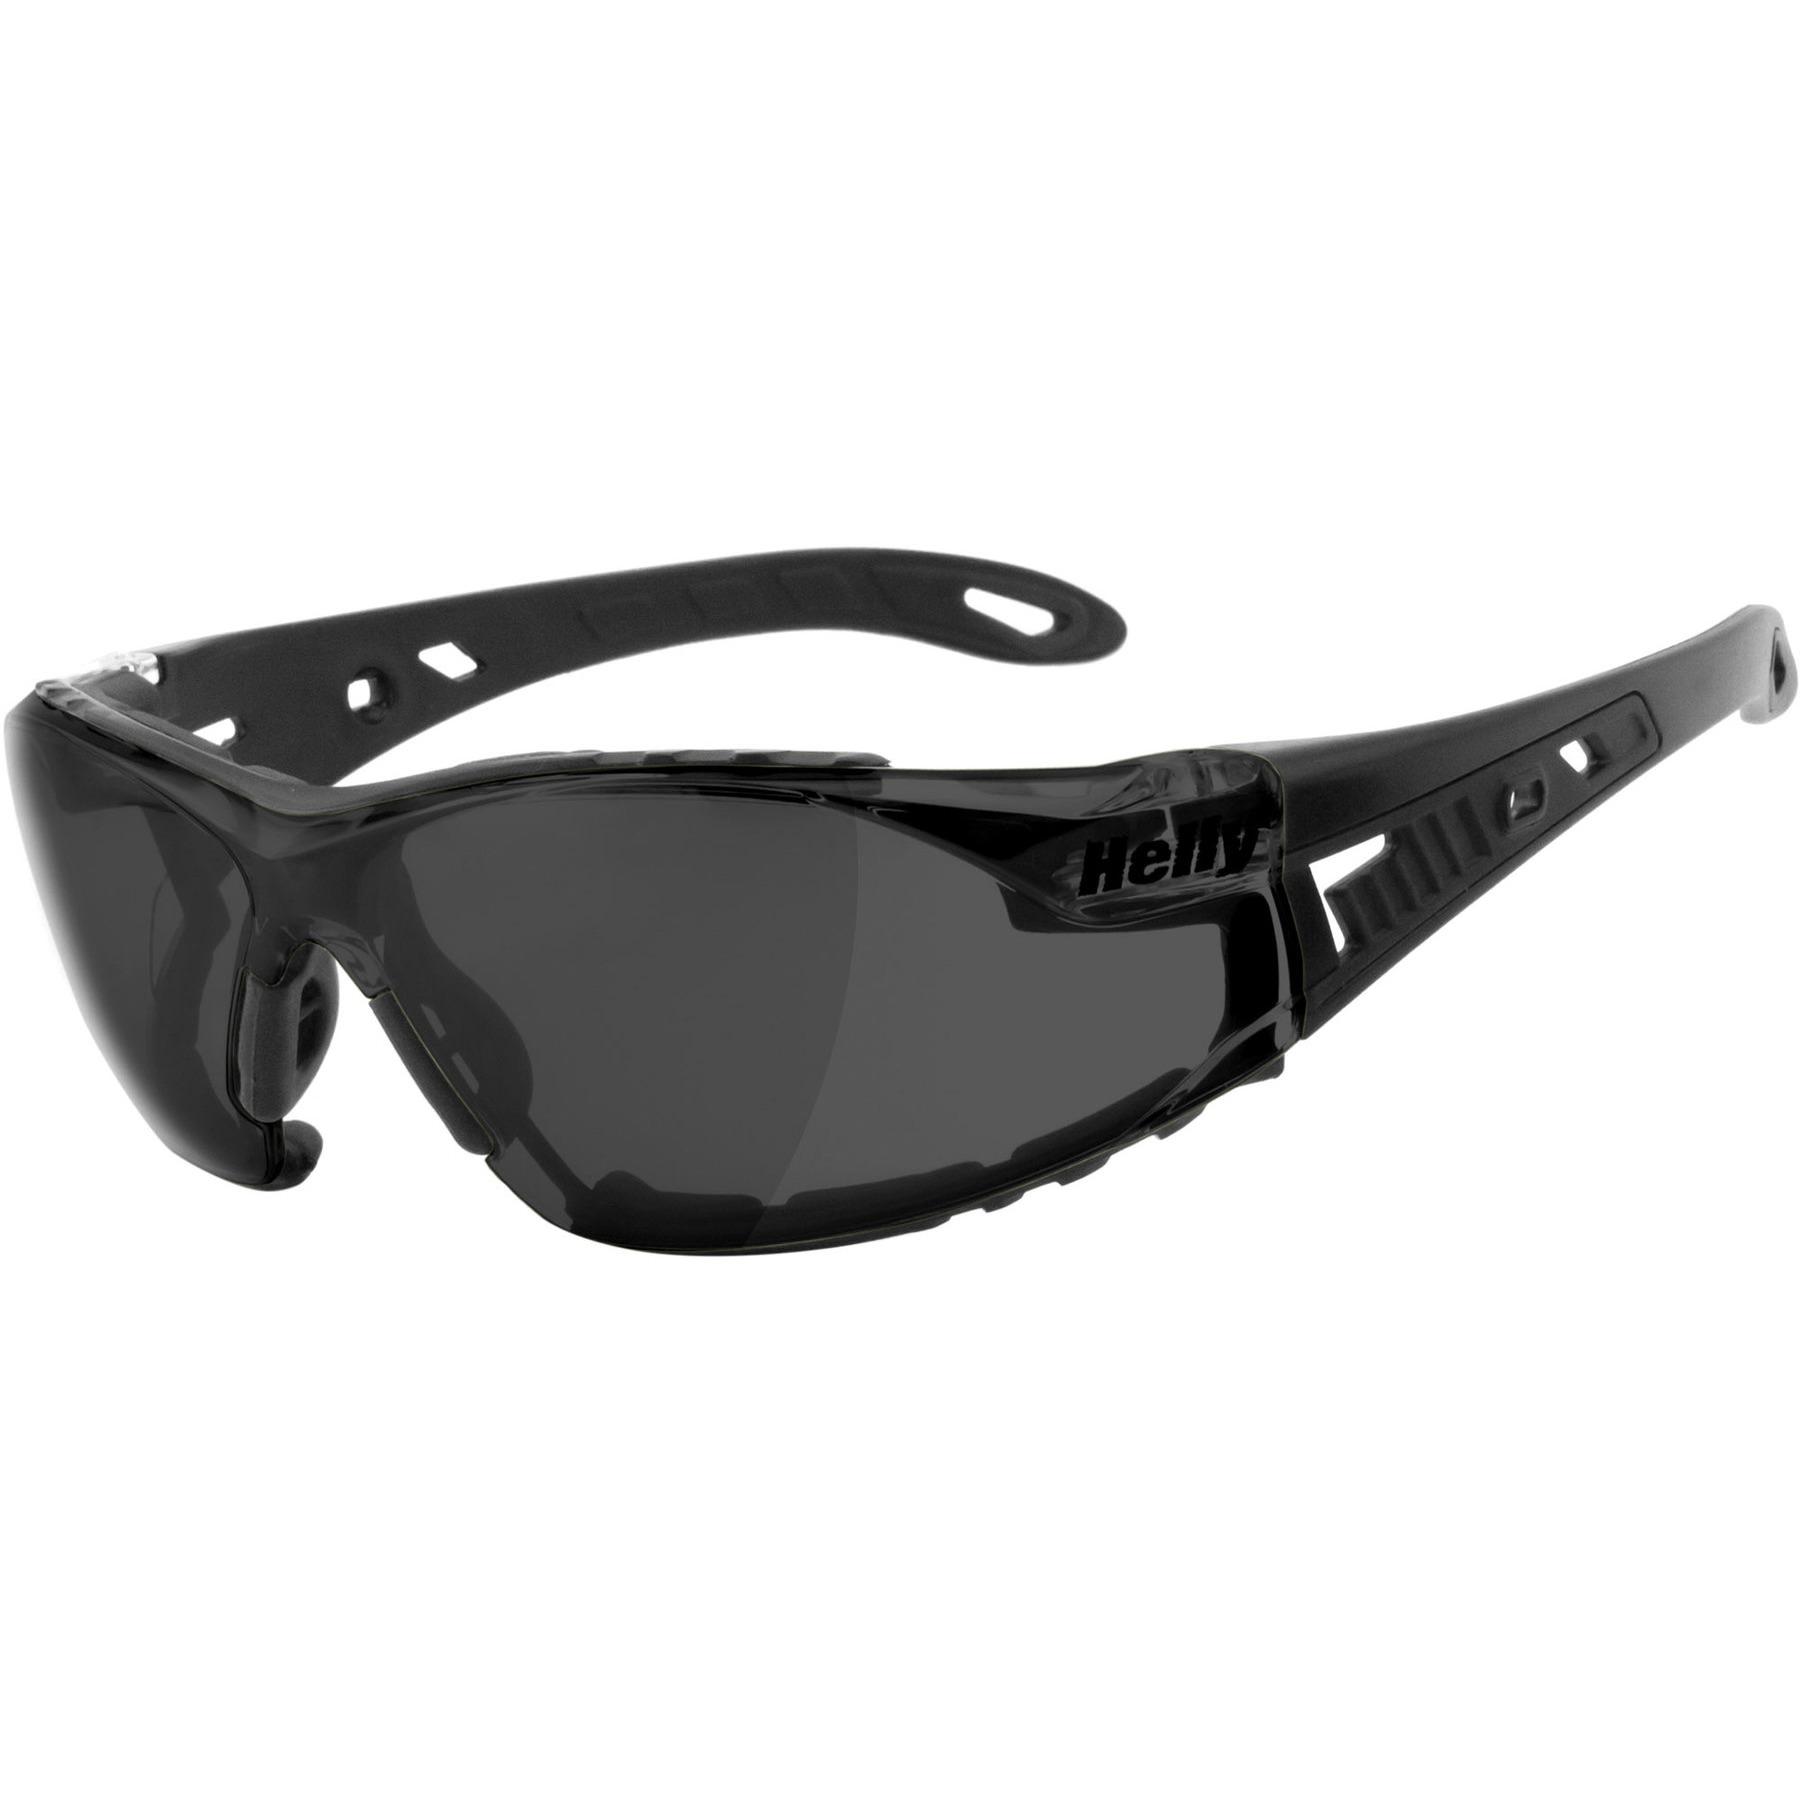 Helly Bikereyes Moab 4 Smoke Biker Occhiali Moto Occhiali Occhiali Da Sole Occhiali